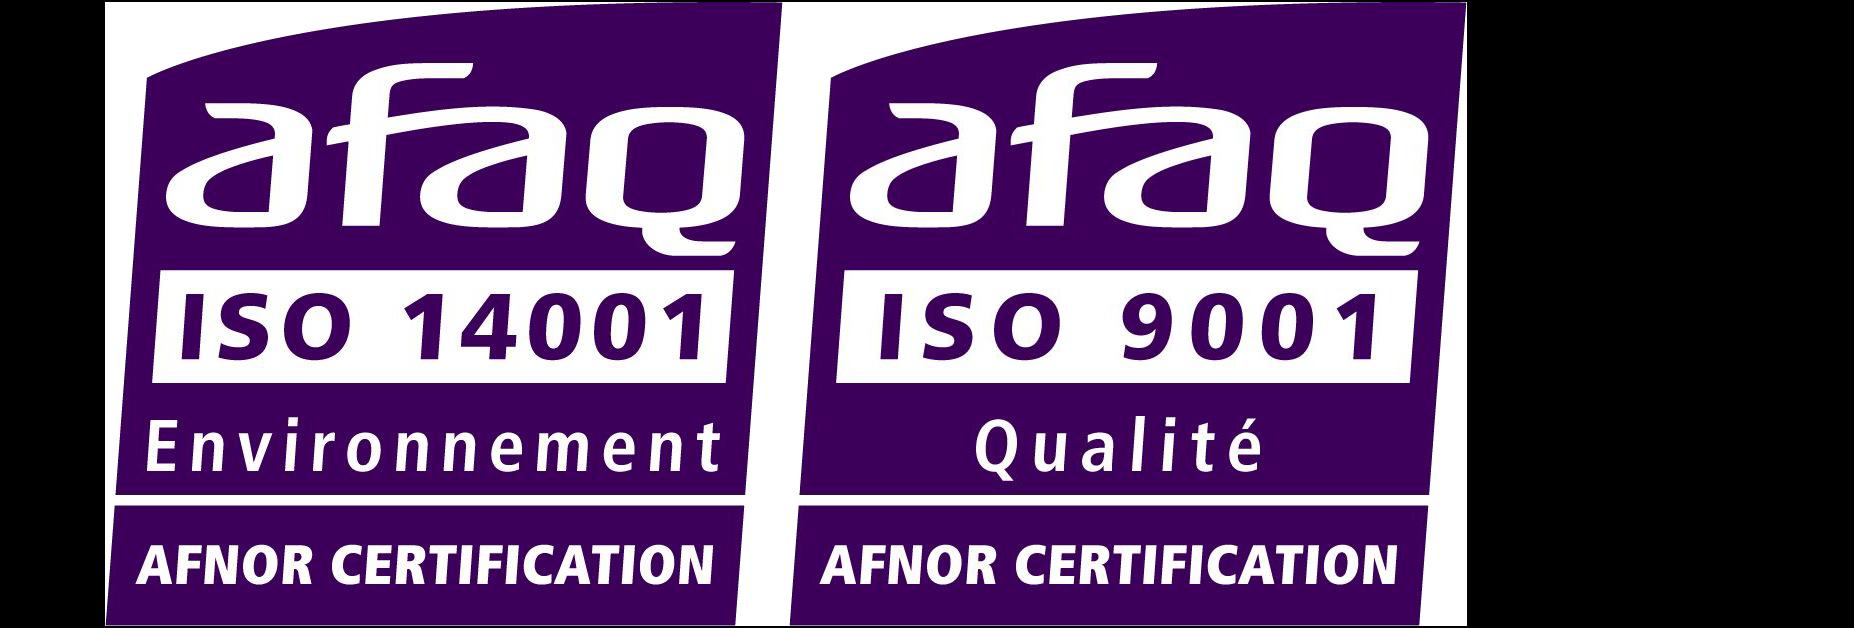 Afaq_9001 et 14001